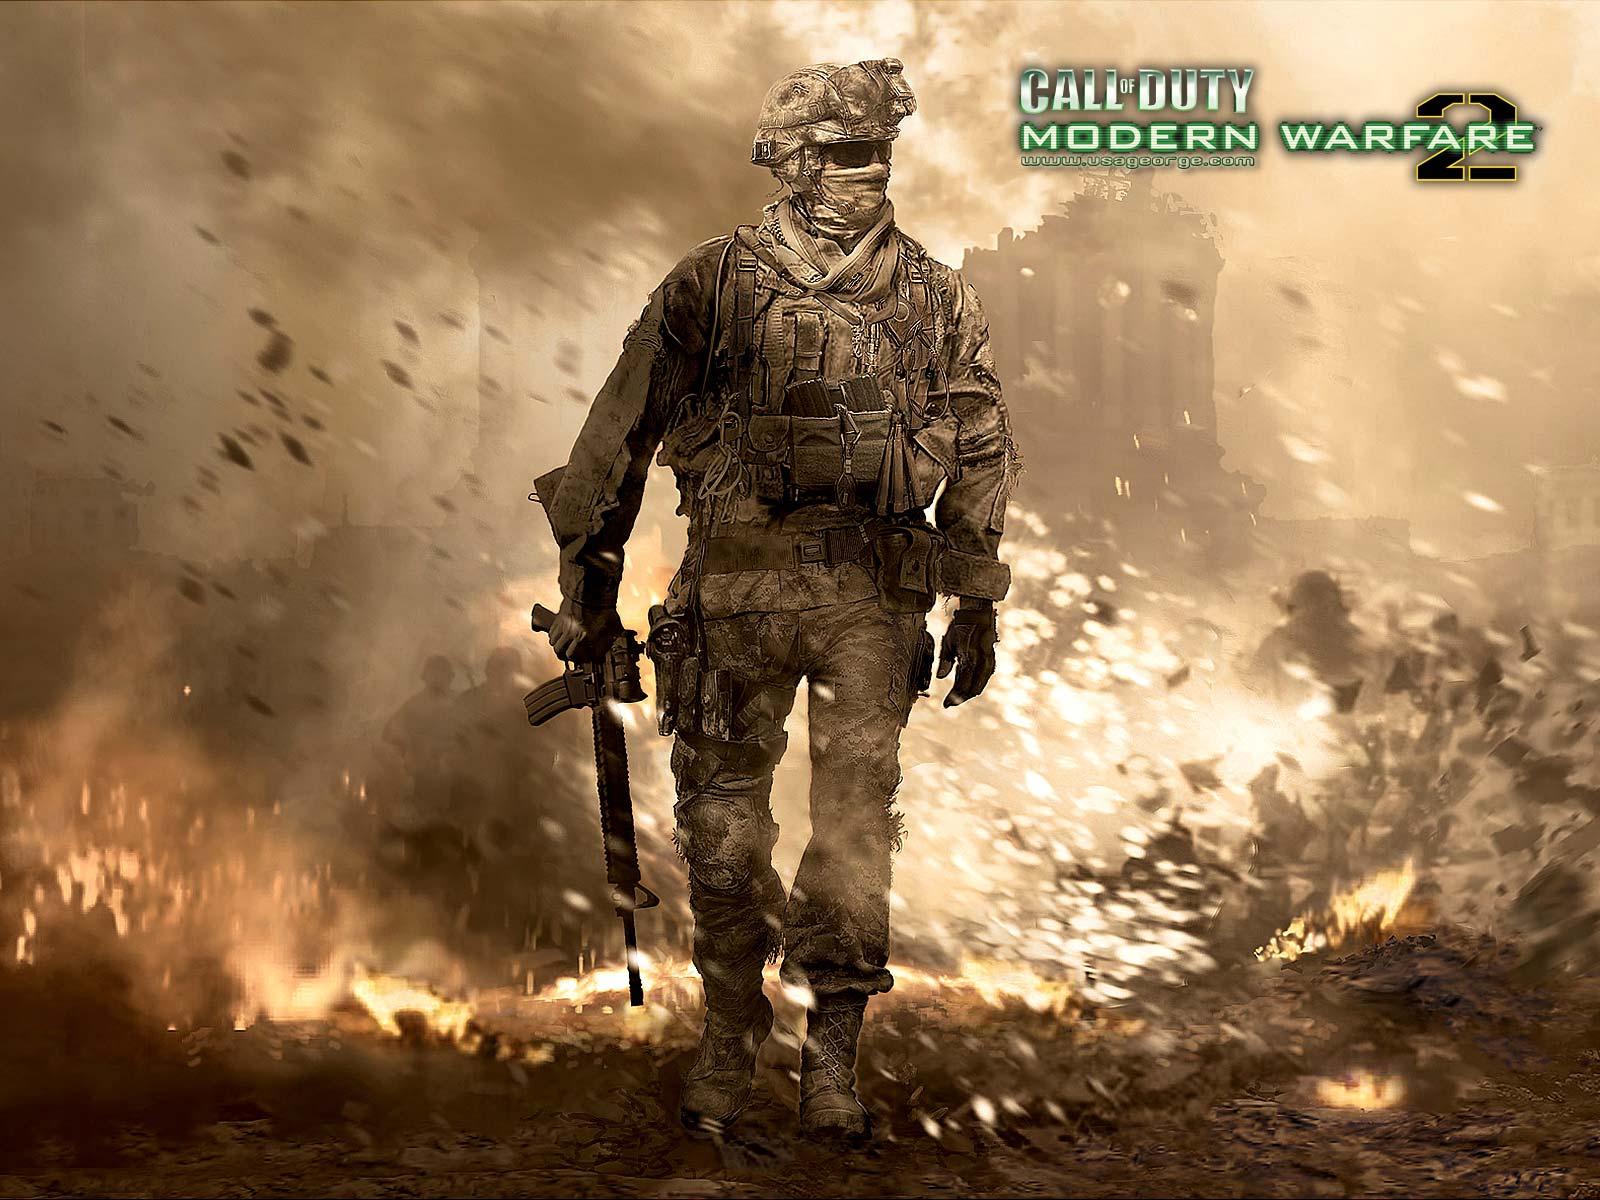 Modern Warfare 2 Wallpapers Top Free Modern Warfare 2 Backgrounds Wallpaperaccess